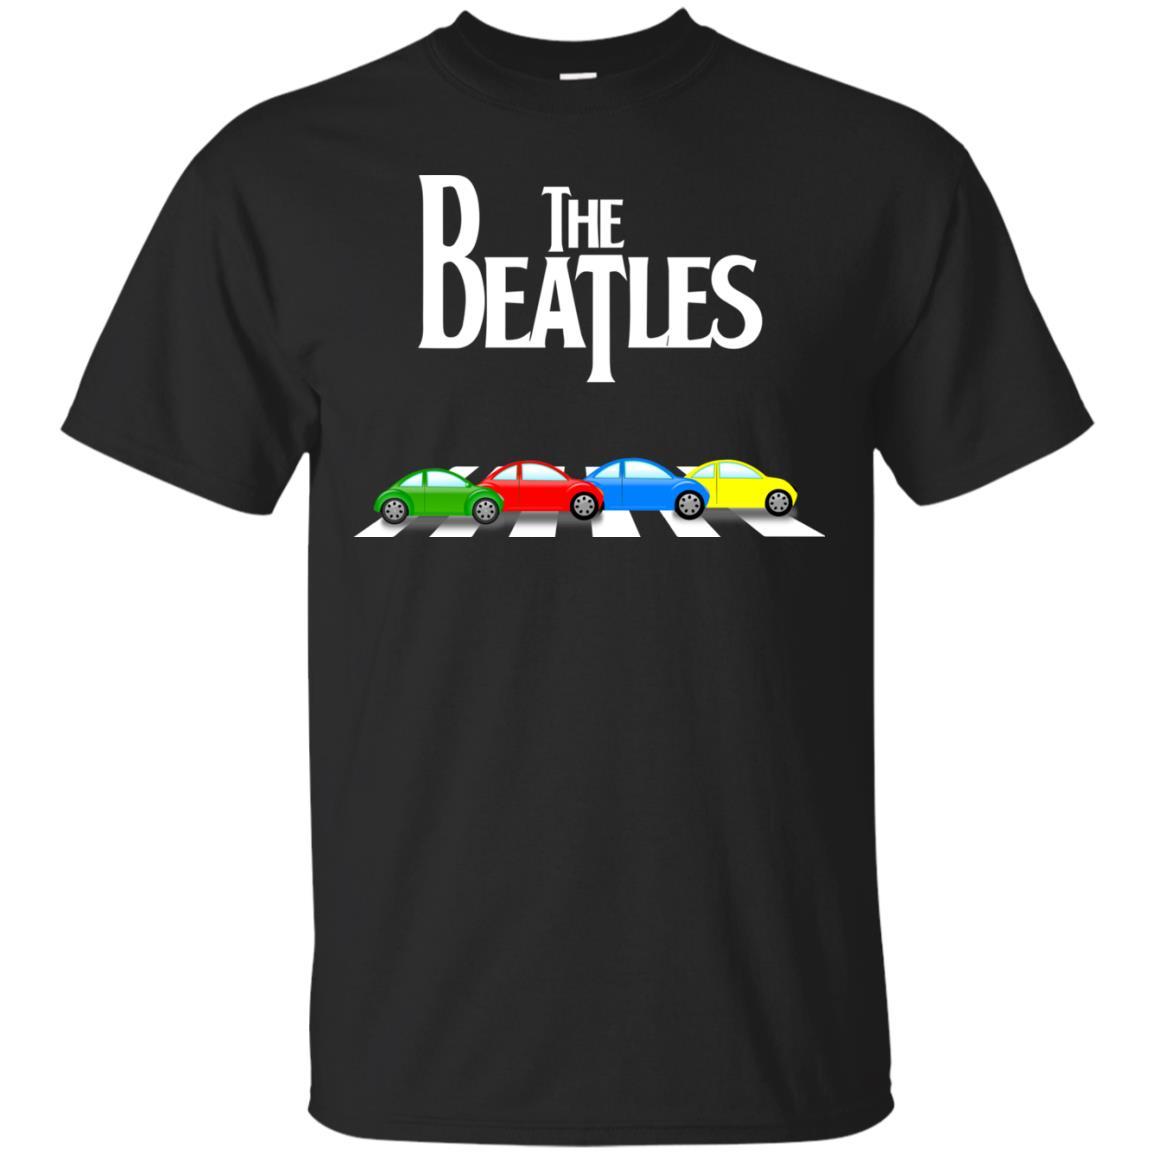 image 326 - The Beatles cars shirt, hoodie, tank